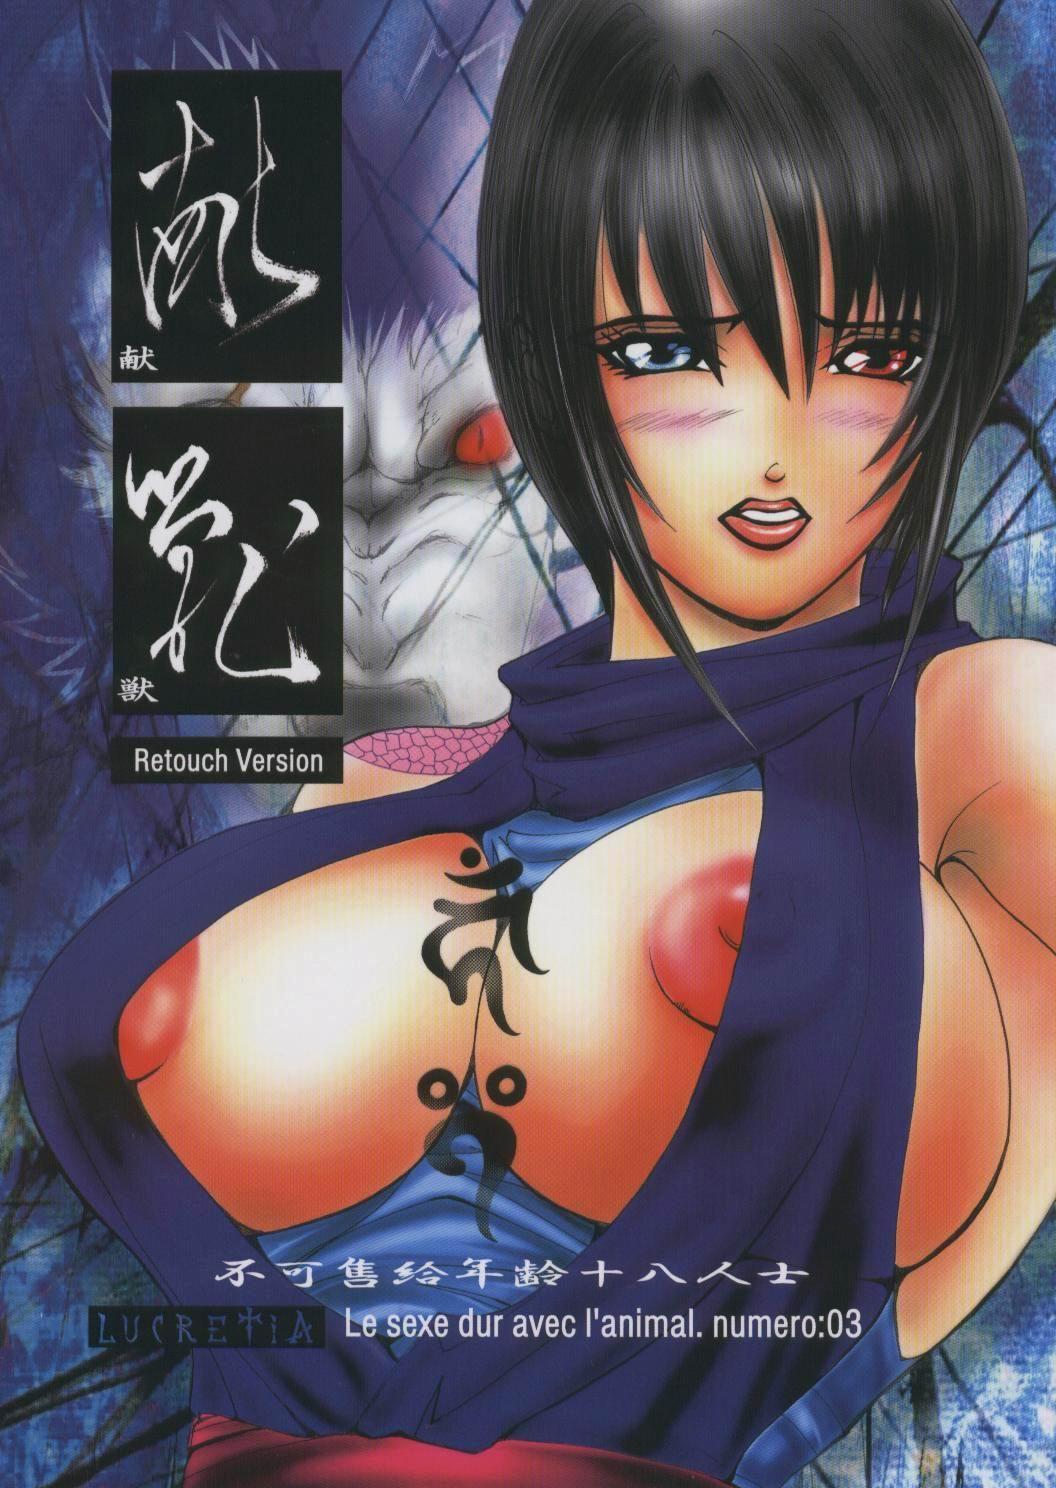 [LUCRETiA (Hiichan)] Ken-Jyuu Retouch Version - Le sexe dur avec l'animal. numero:03 (Samurai Spirits) 0